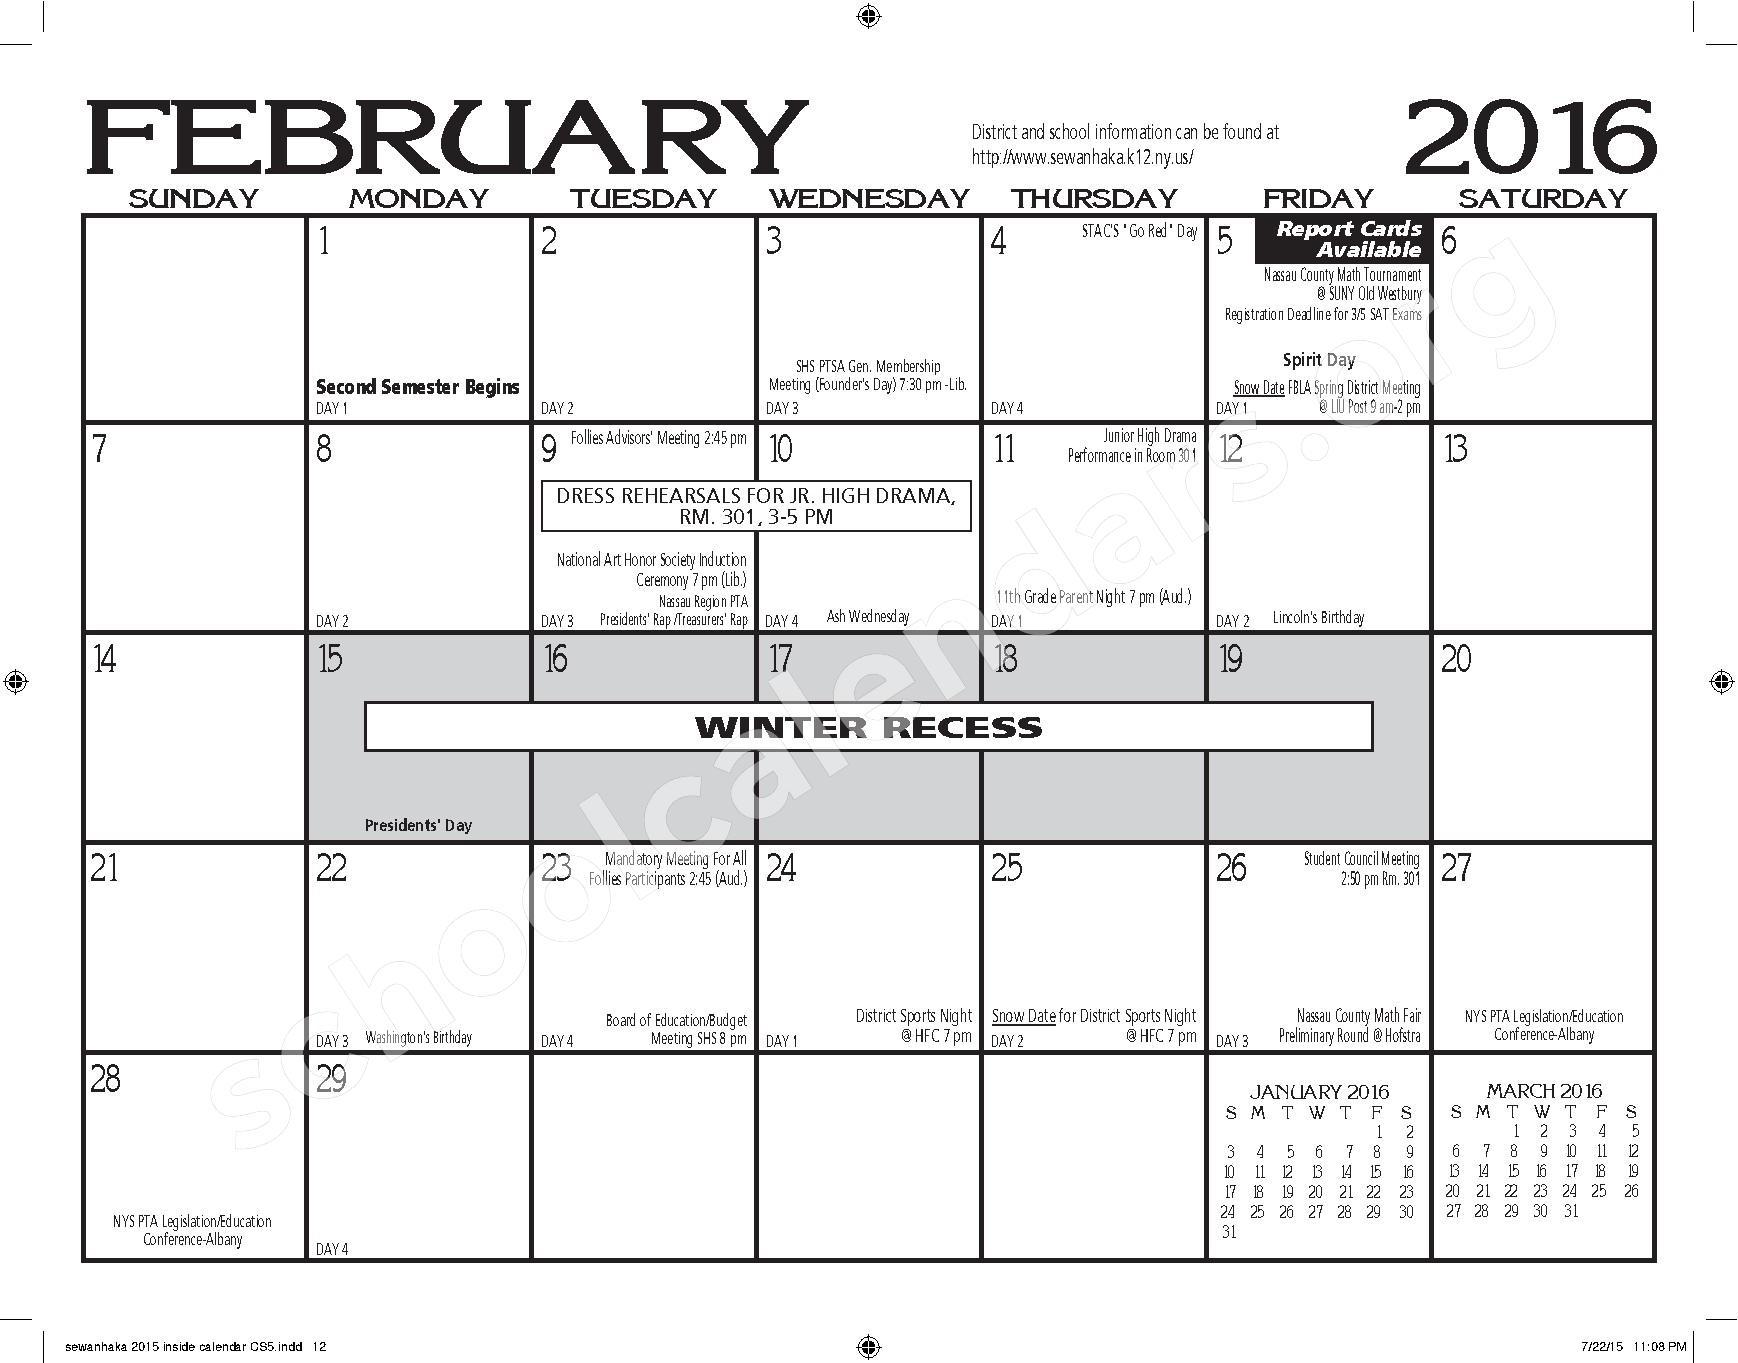 Sewanhaka High School Calendars